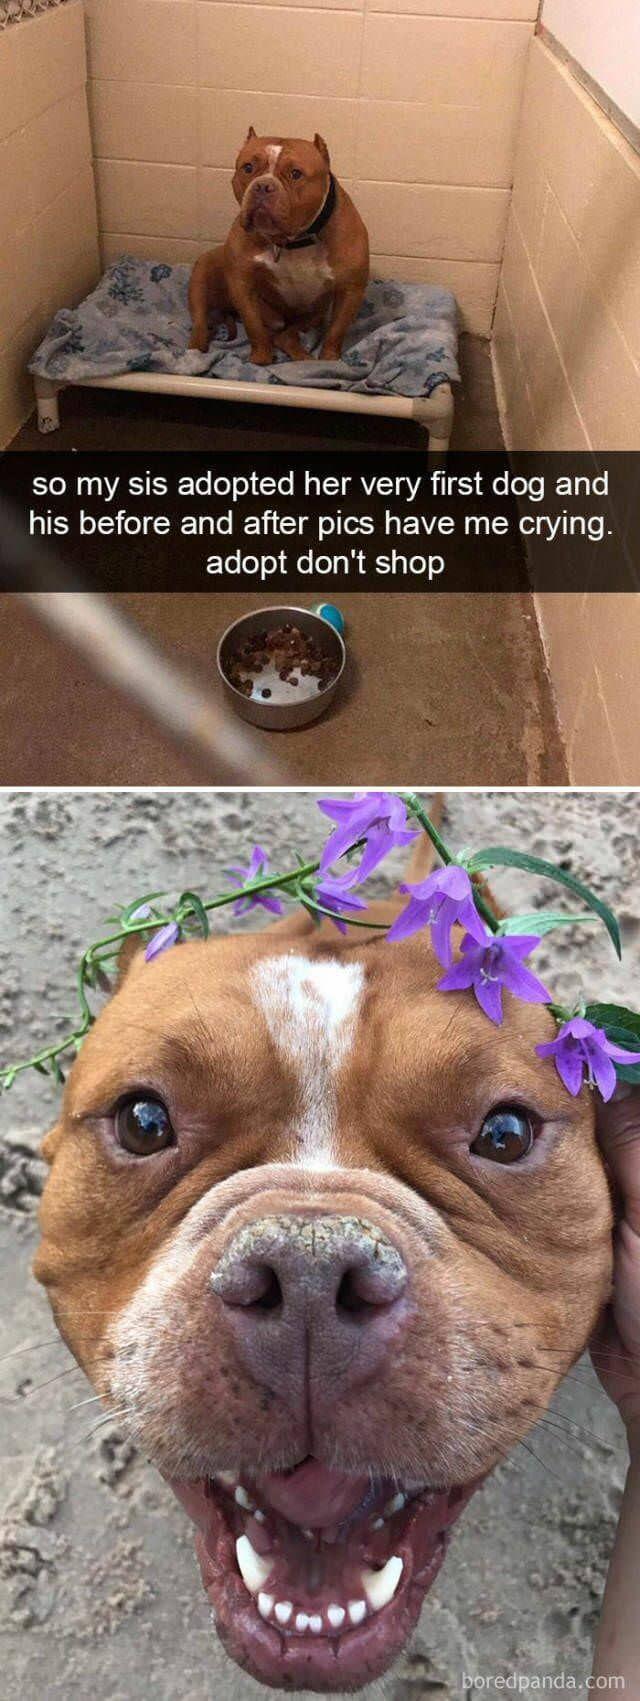 42 #Lustig #Hund #Memes #Welche #Machen #Sie #Fallen #In #Liebe #Mit #Them #Auf #Funydogs #Topdogs #Hundememes #Cutedog #Cutepuppys #Cutedogs #fallmemes